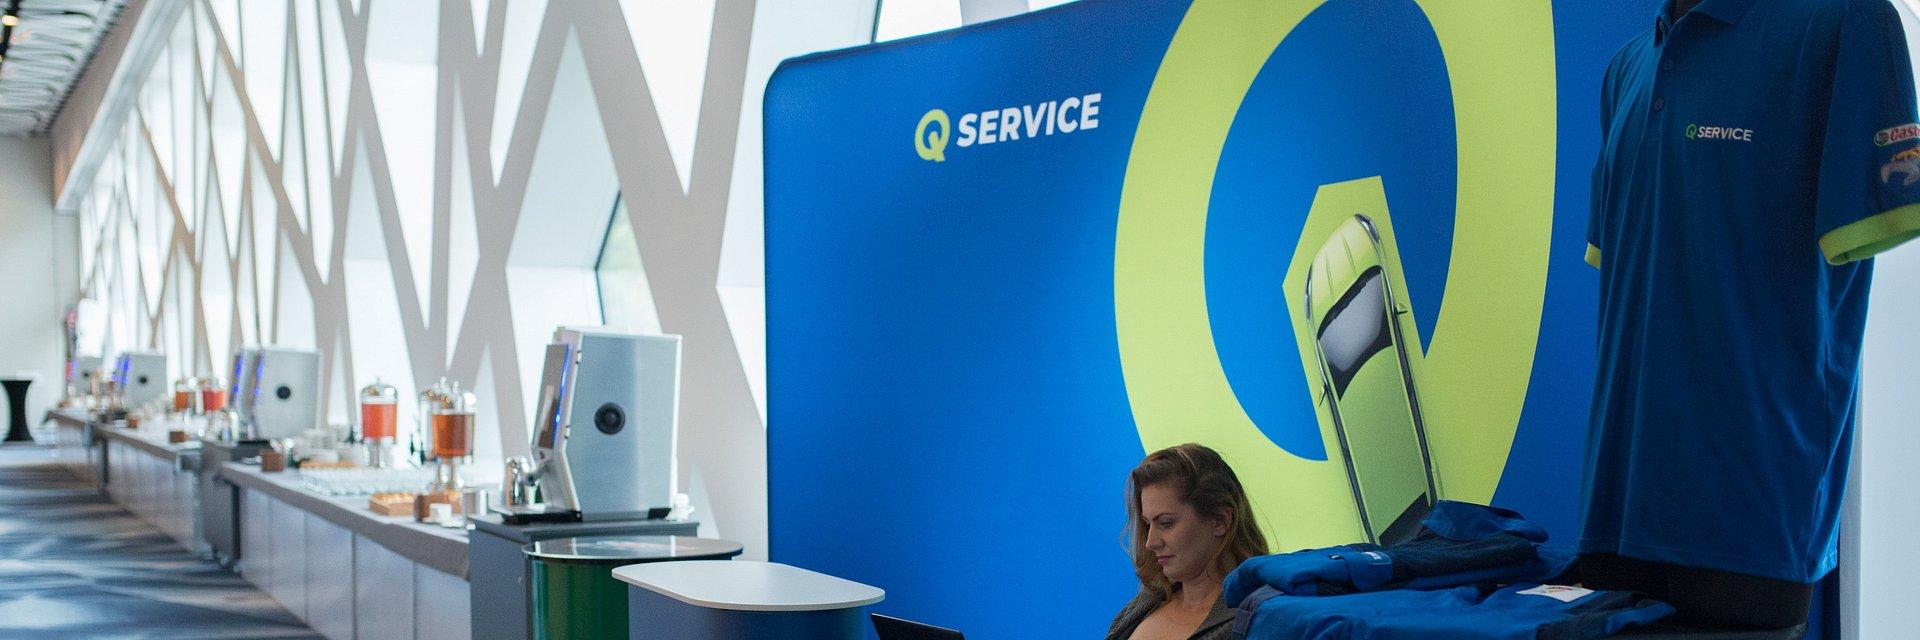 Ofensywa sieci Q-Service